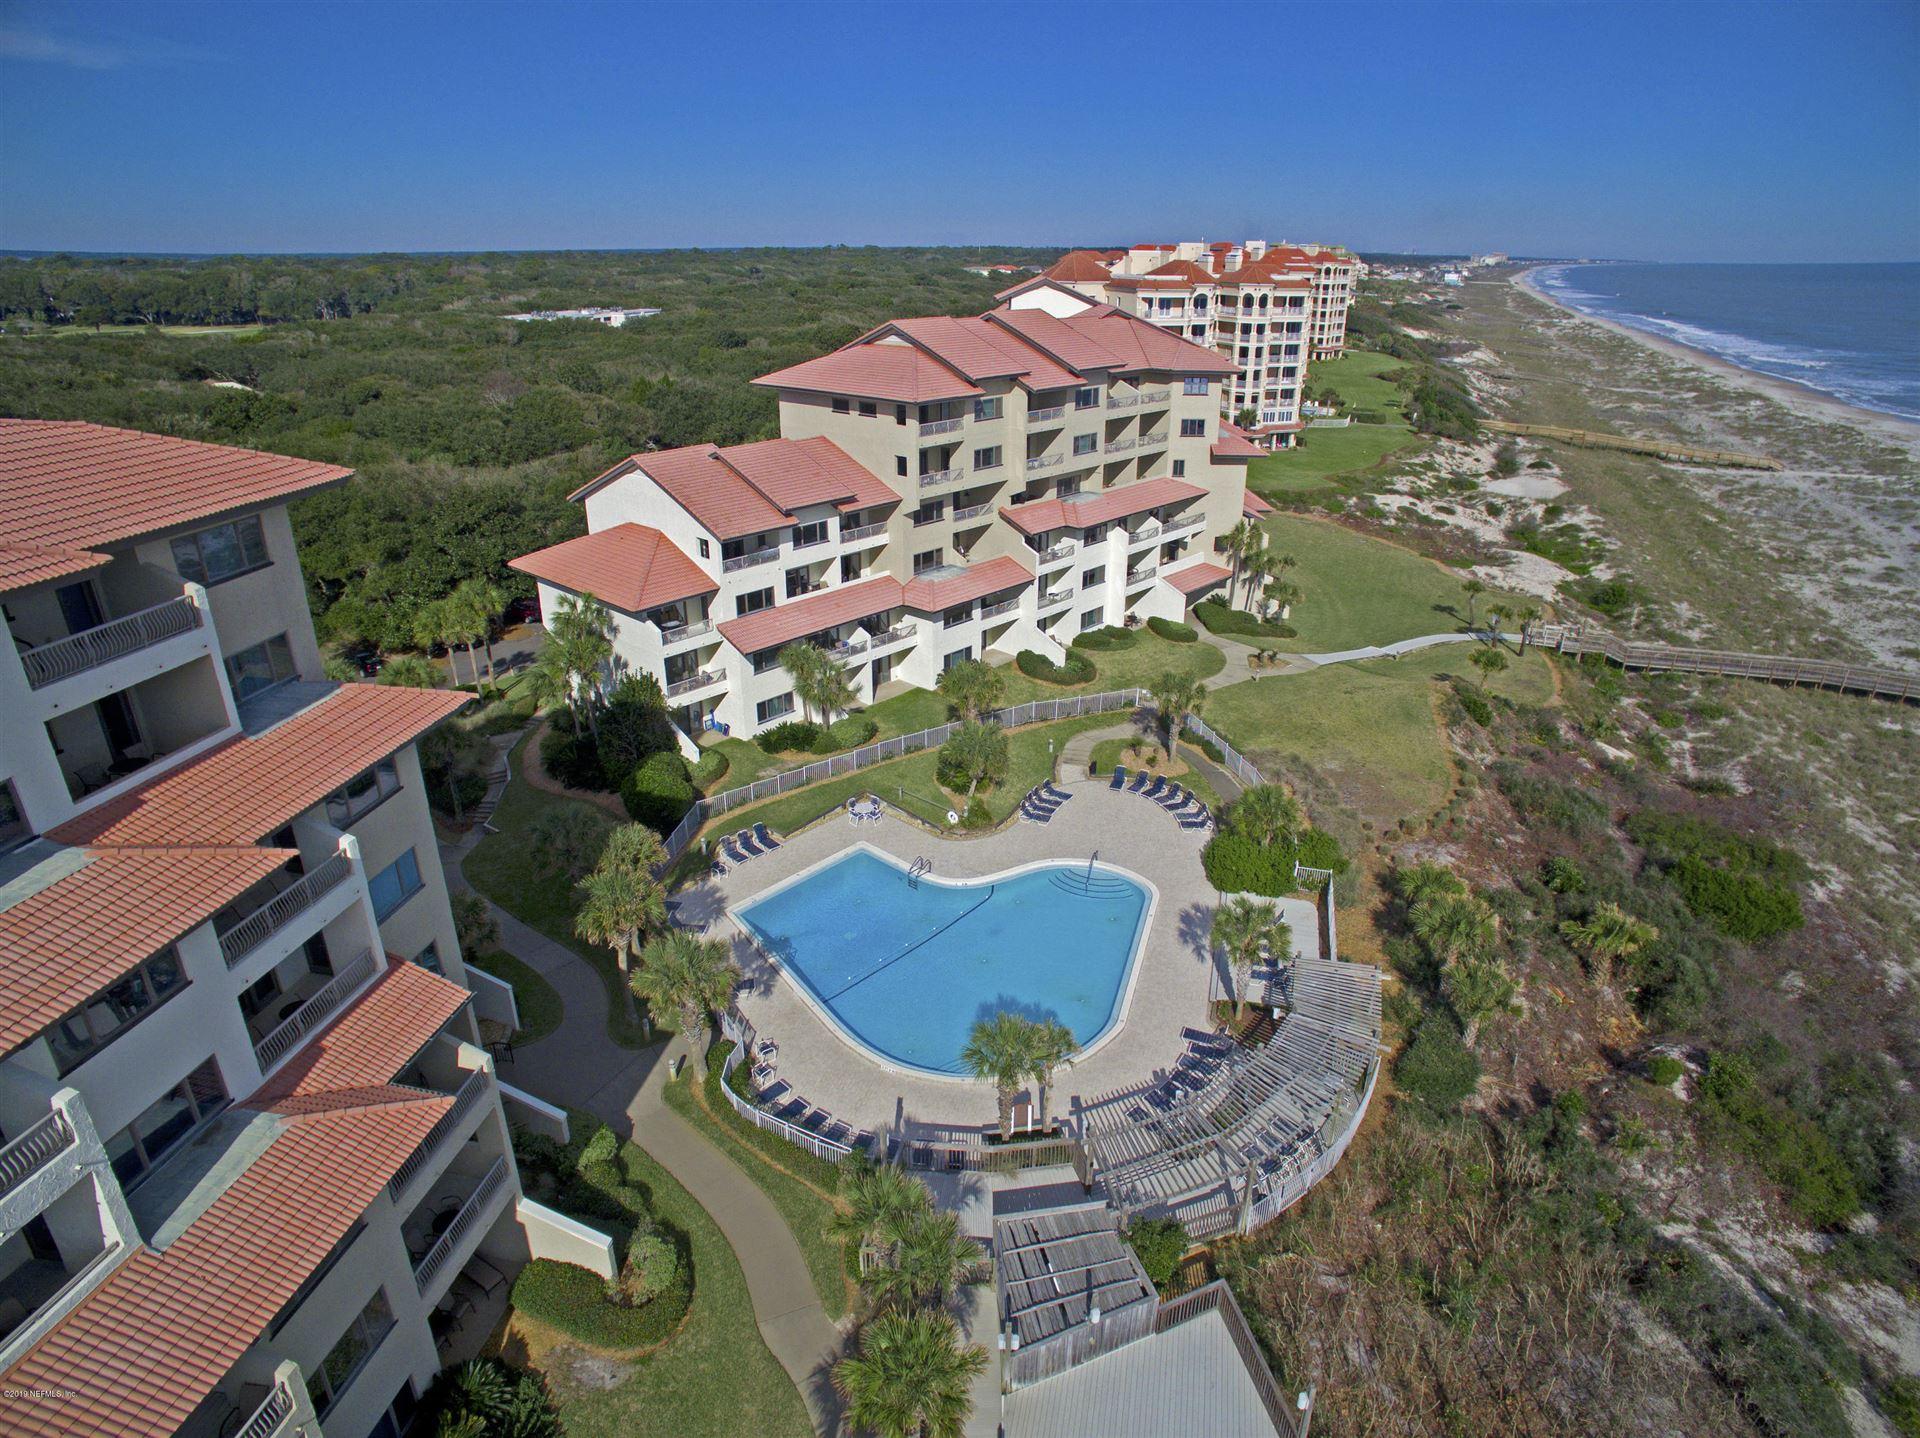 255 Sandcastles Ct, Fernandina Beach, FL 32034 - MLS#: 983314